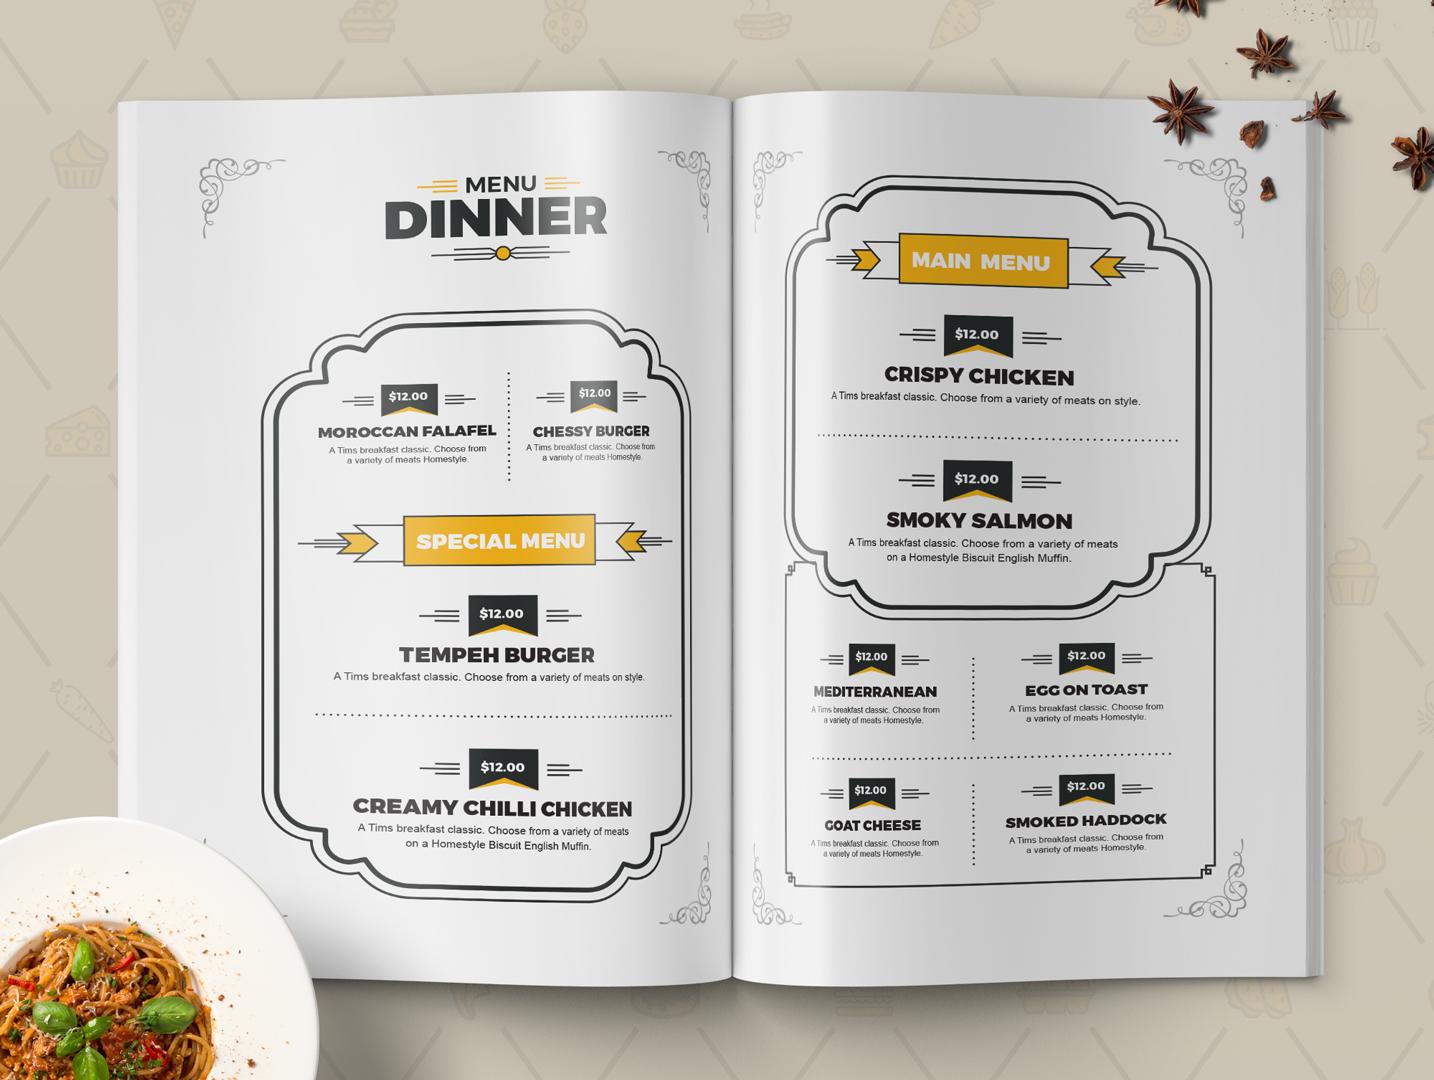 https://s3.tmimgcdn.com/templates/4049/scr/33_Menu-Dinner.jpg